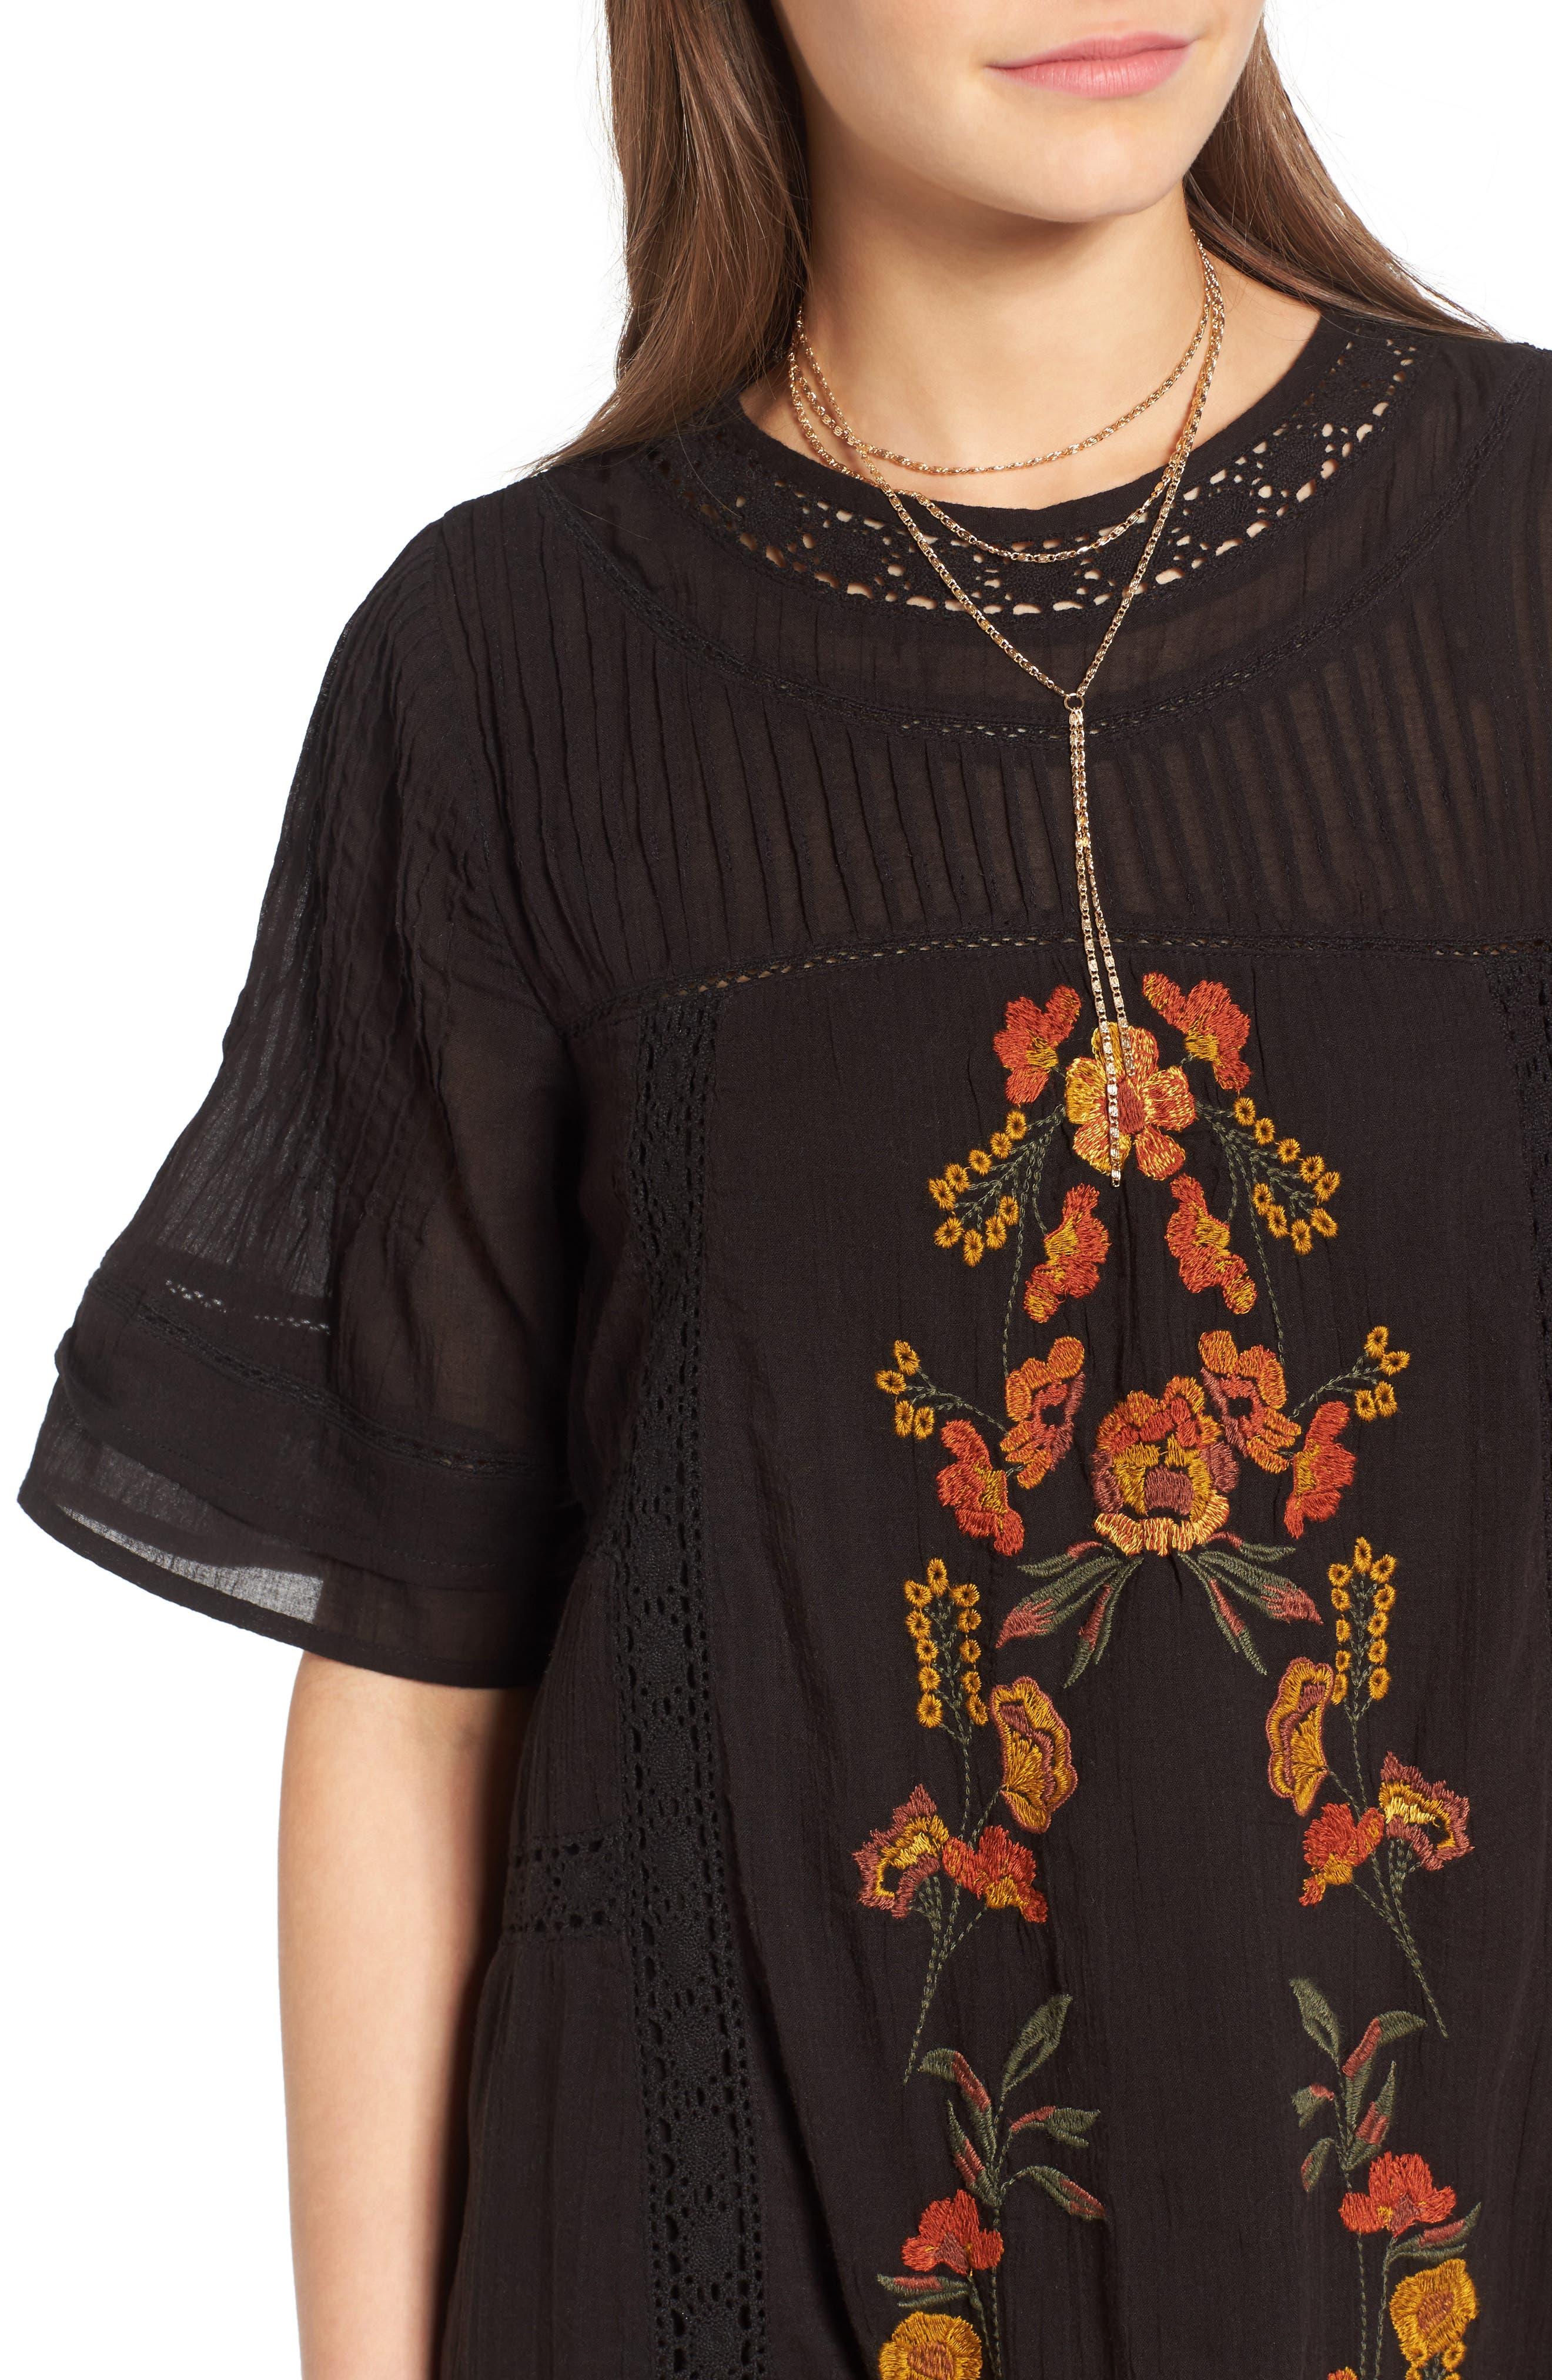 'Perfectly Victorian' Minidress,                             Alternate thumbnail 4, color,                             BLACK COMBO